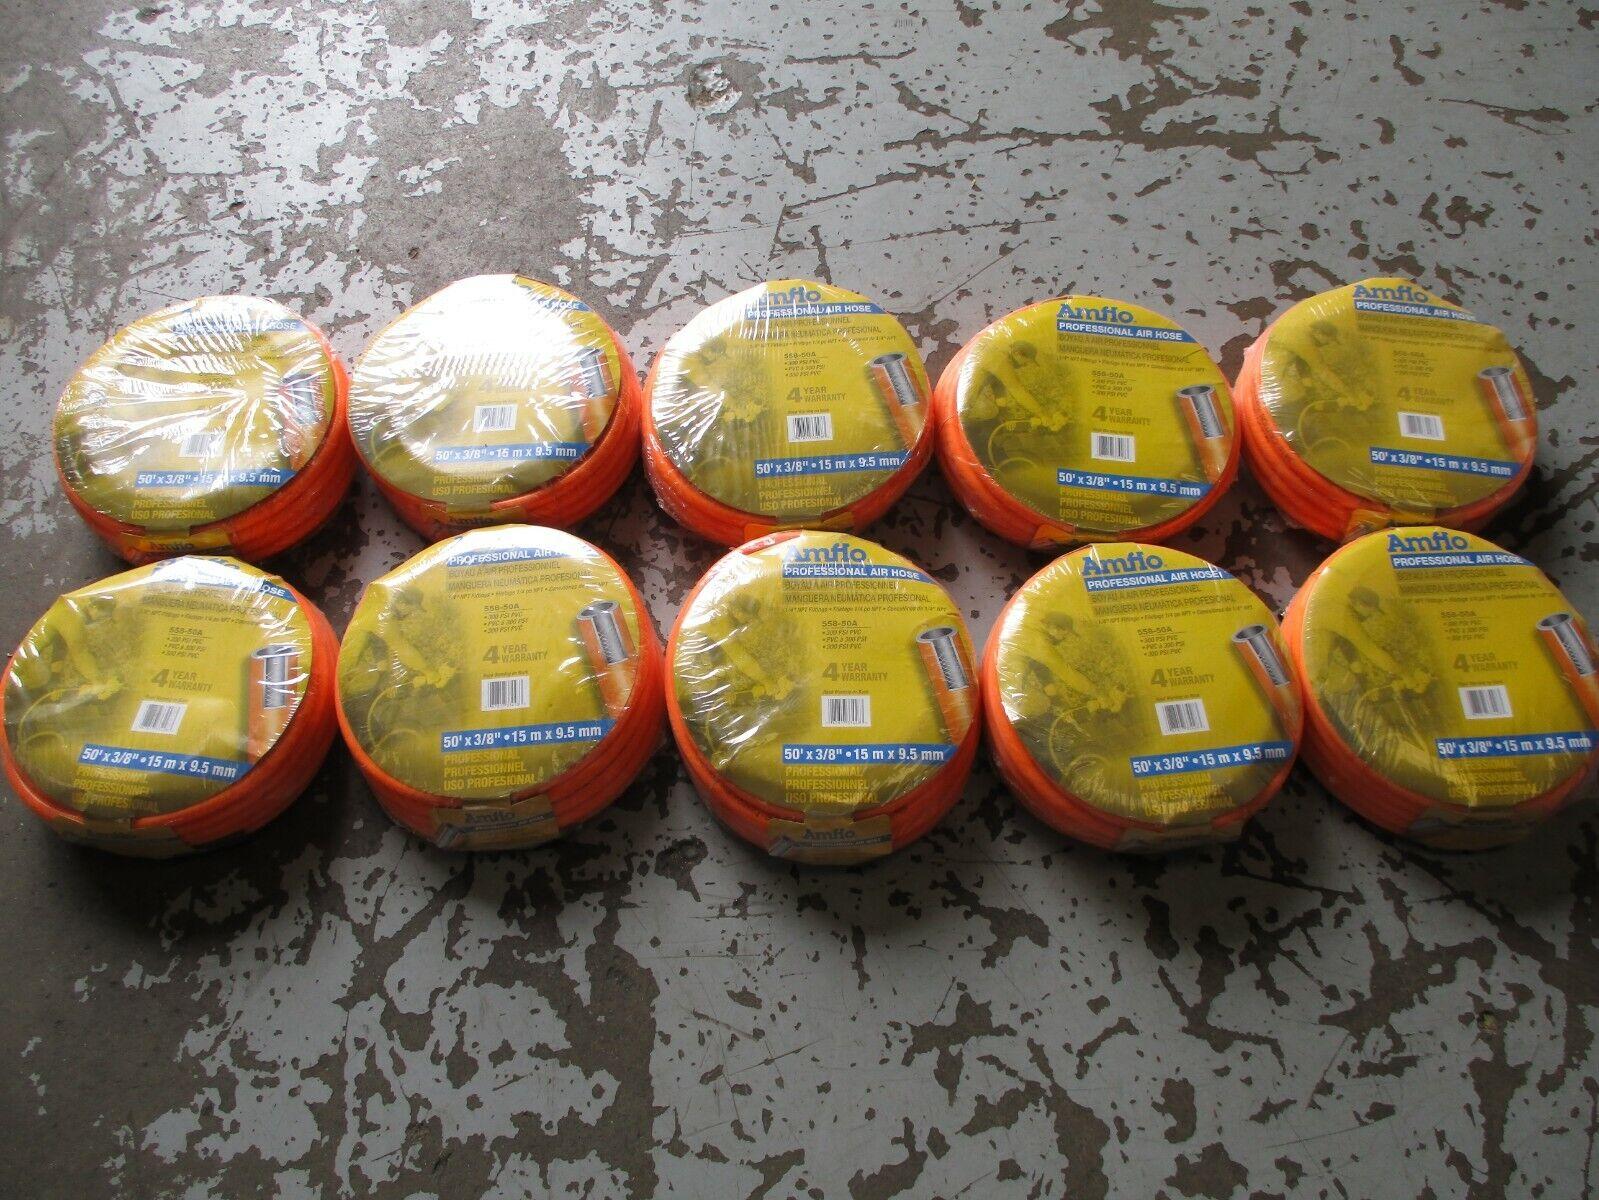 10 PK AMFLO PRO AIR HOSE PART   558-50A 50' x 3 8  1 4  NTP FITTINGS 300 PSI PVC